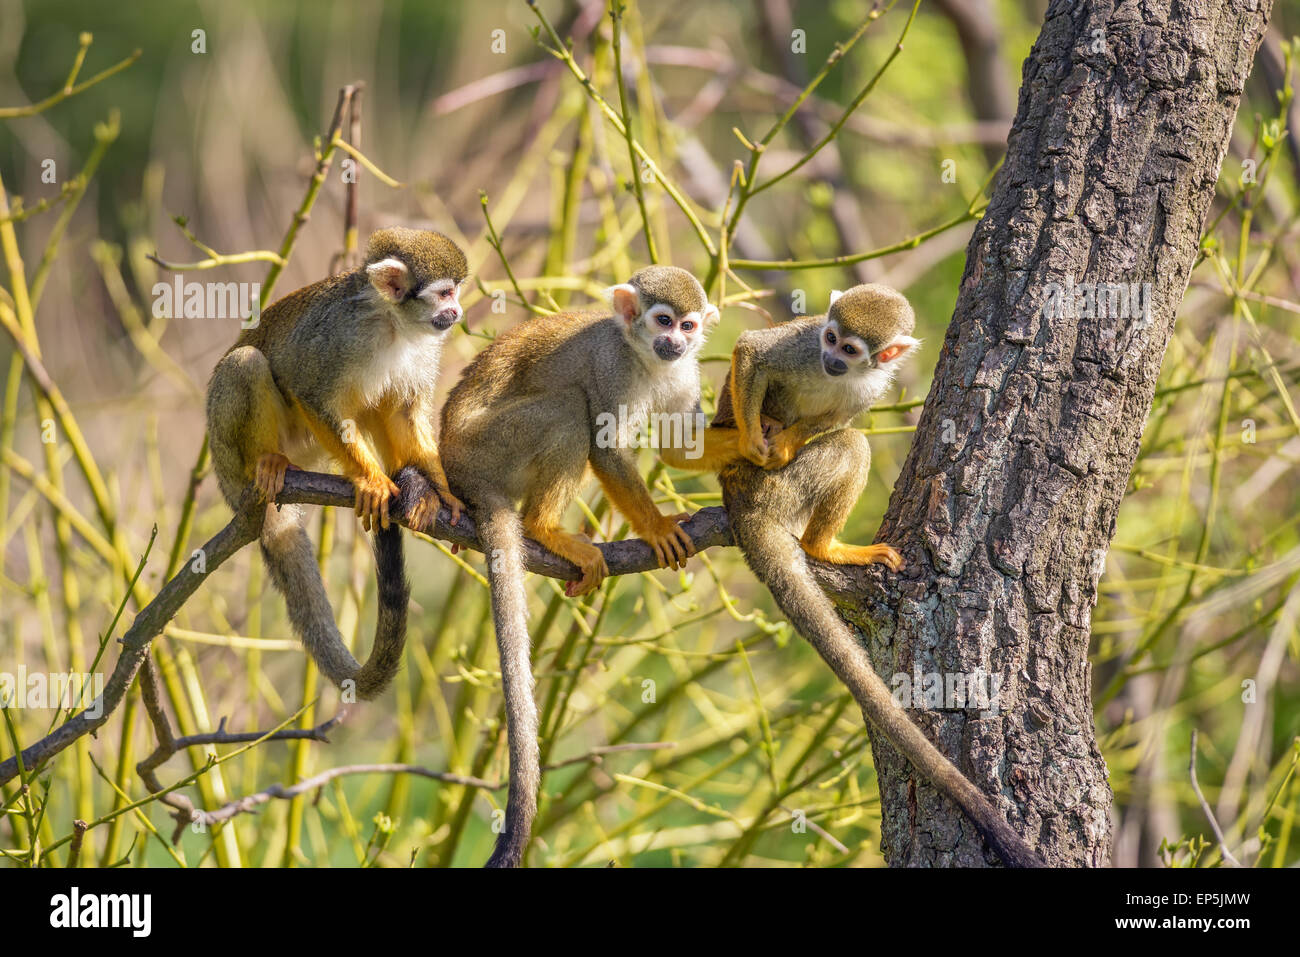 Squirrel monkeys in trees - photo#31